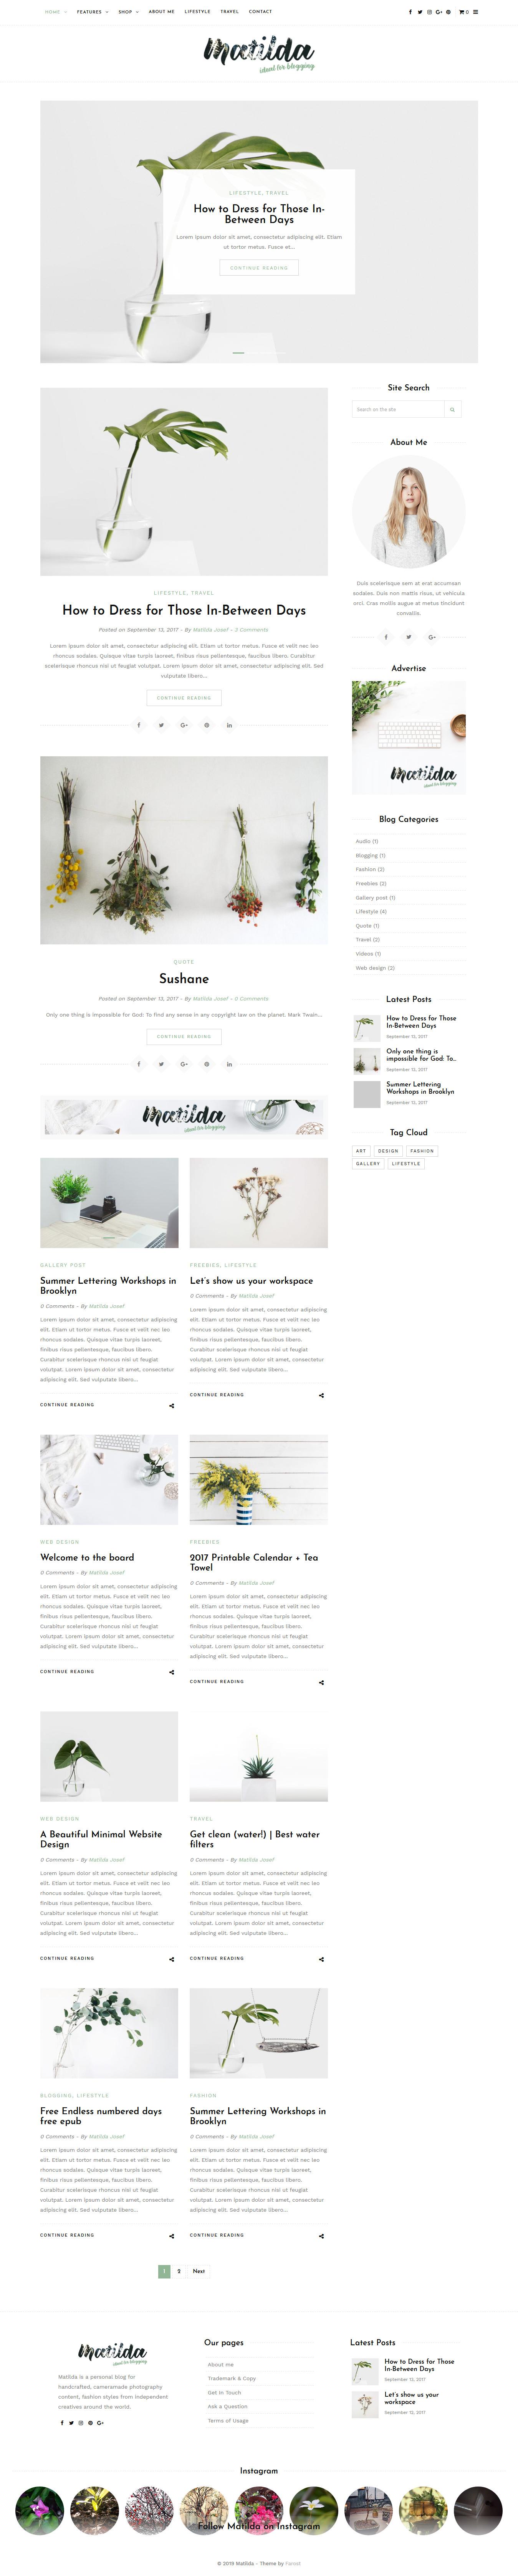 Matilda - Mejor tema de WordPress de estilo de vida premium